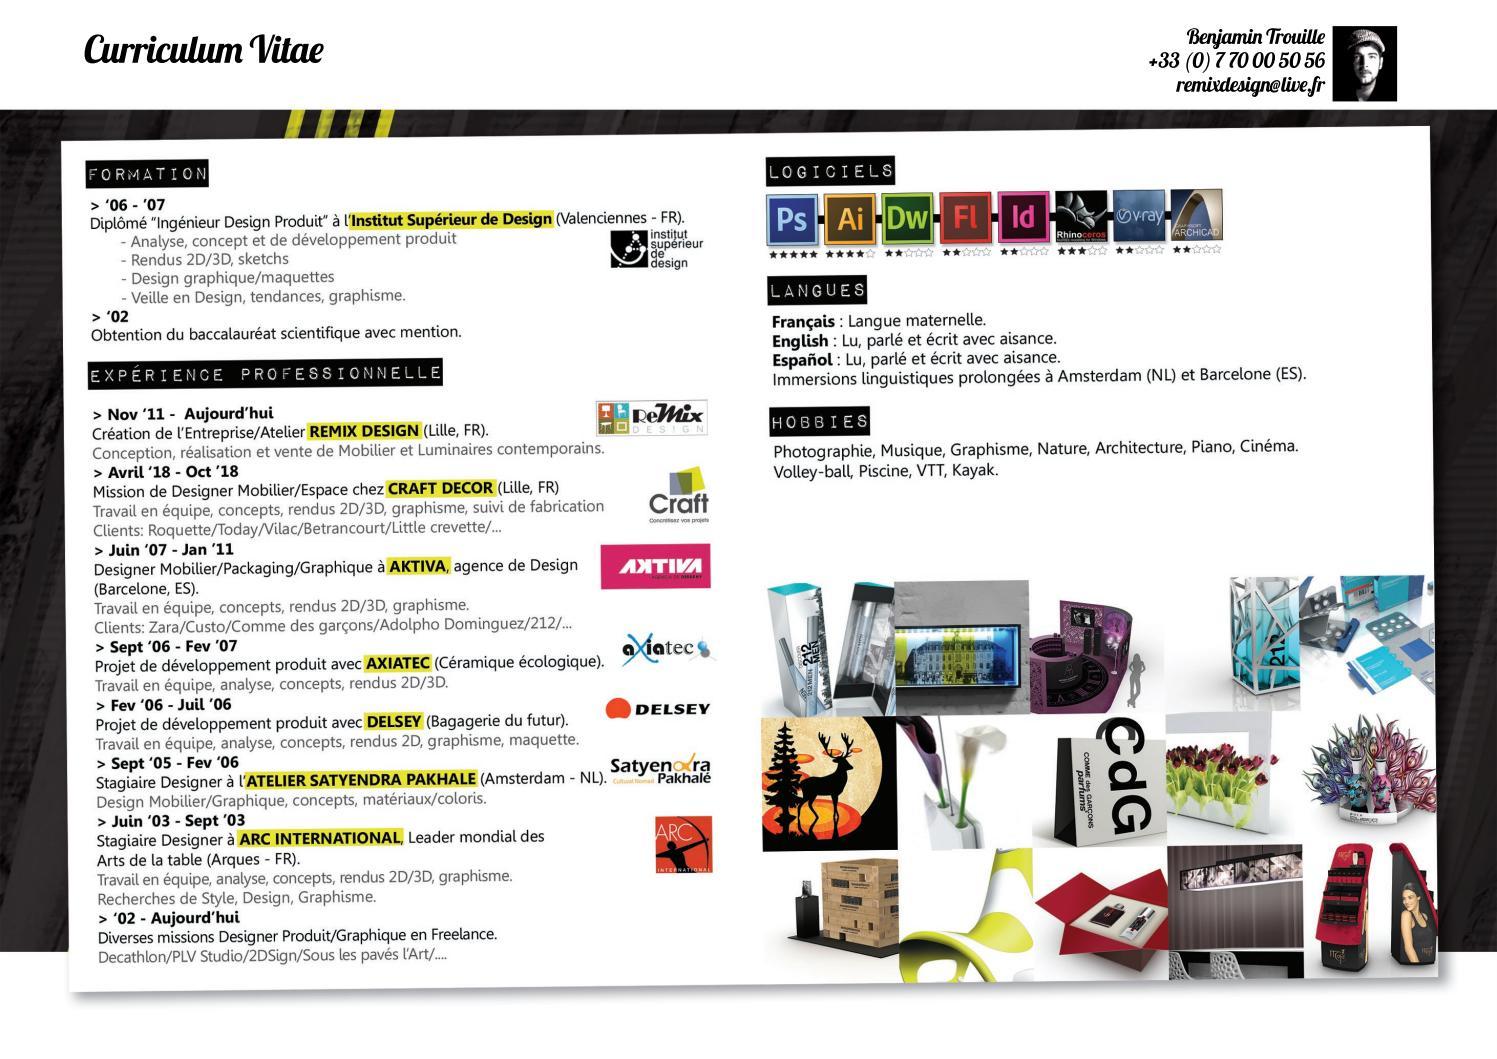 Institut Supérieur De Design Valenciennes cv benjamin trouille product/graphic designerportfolio